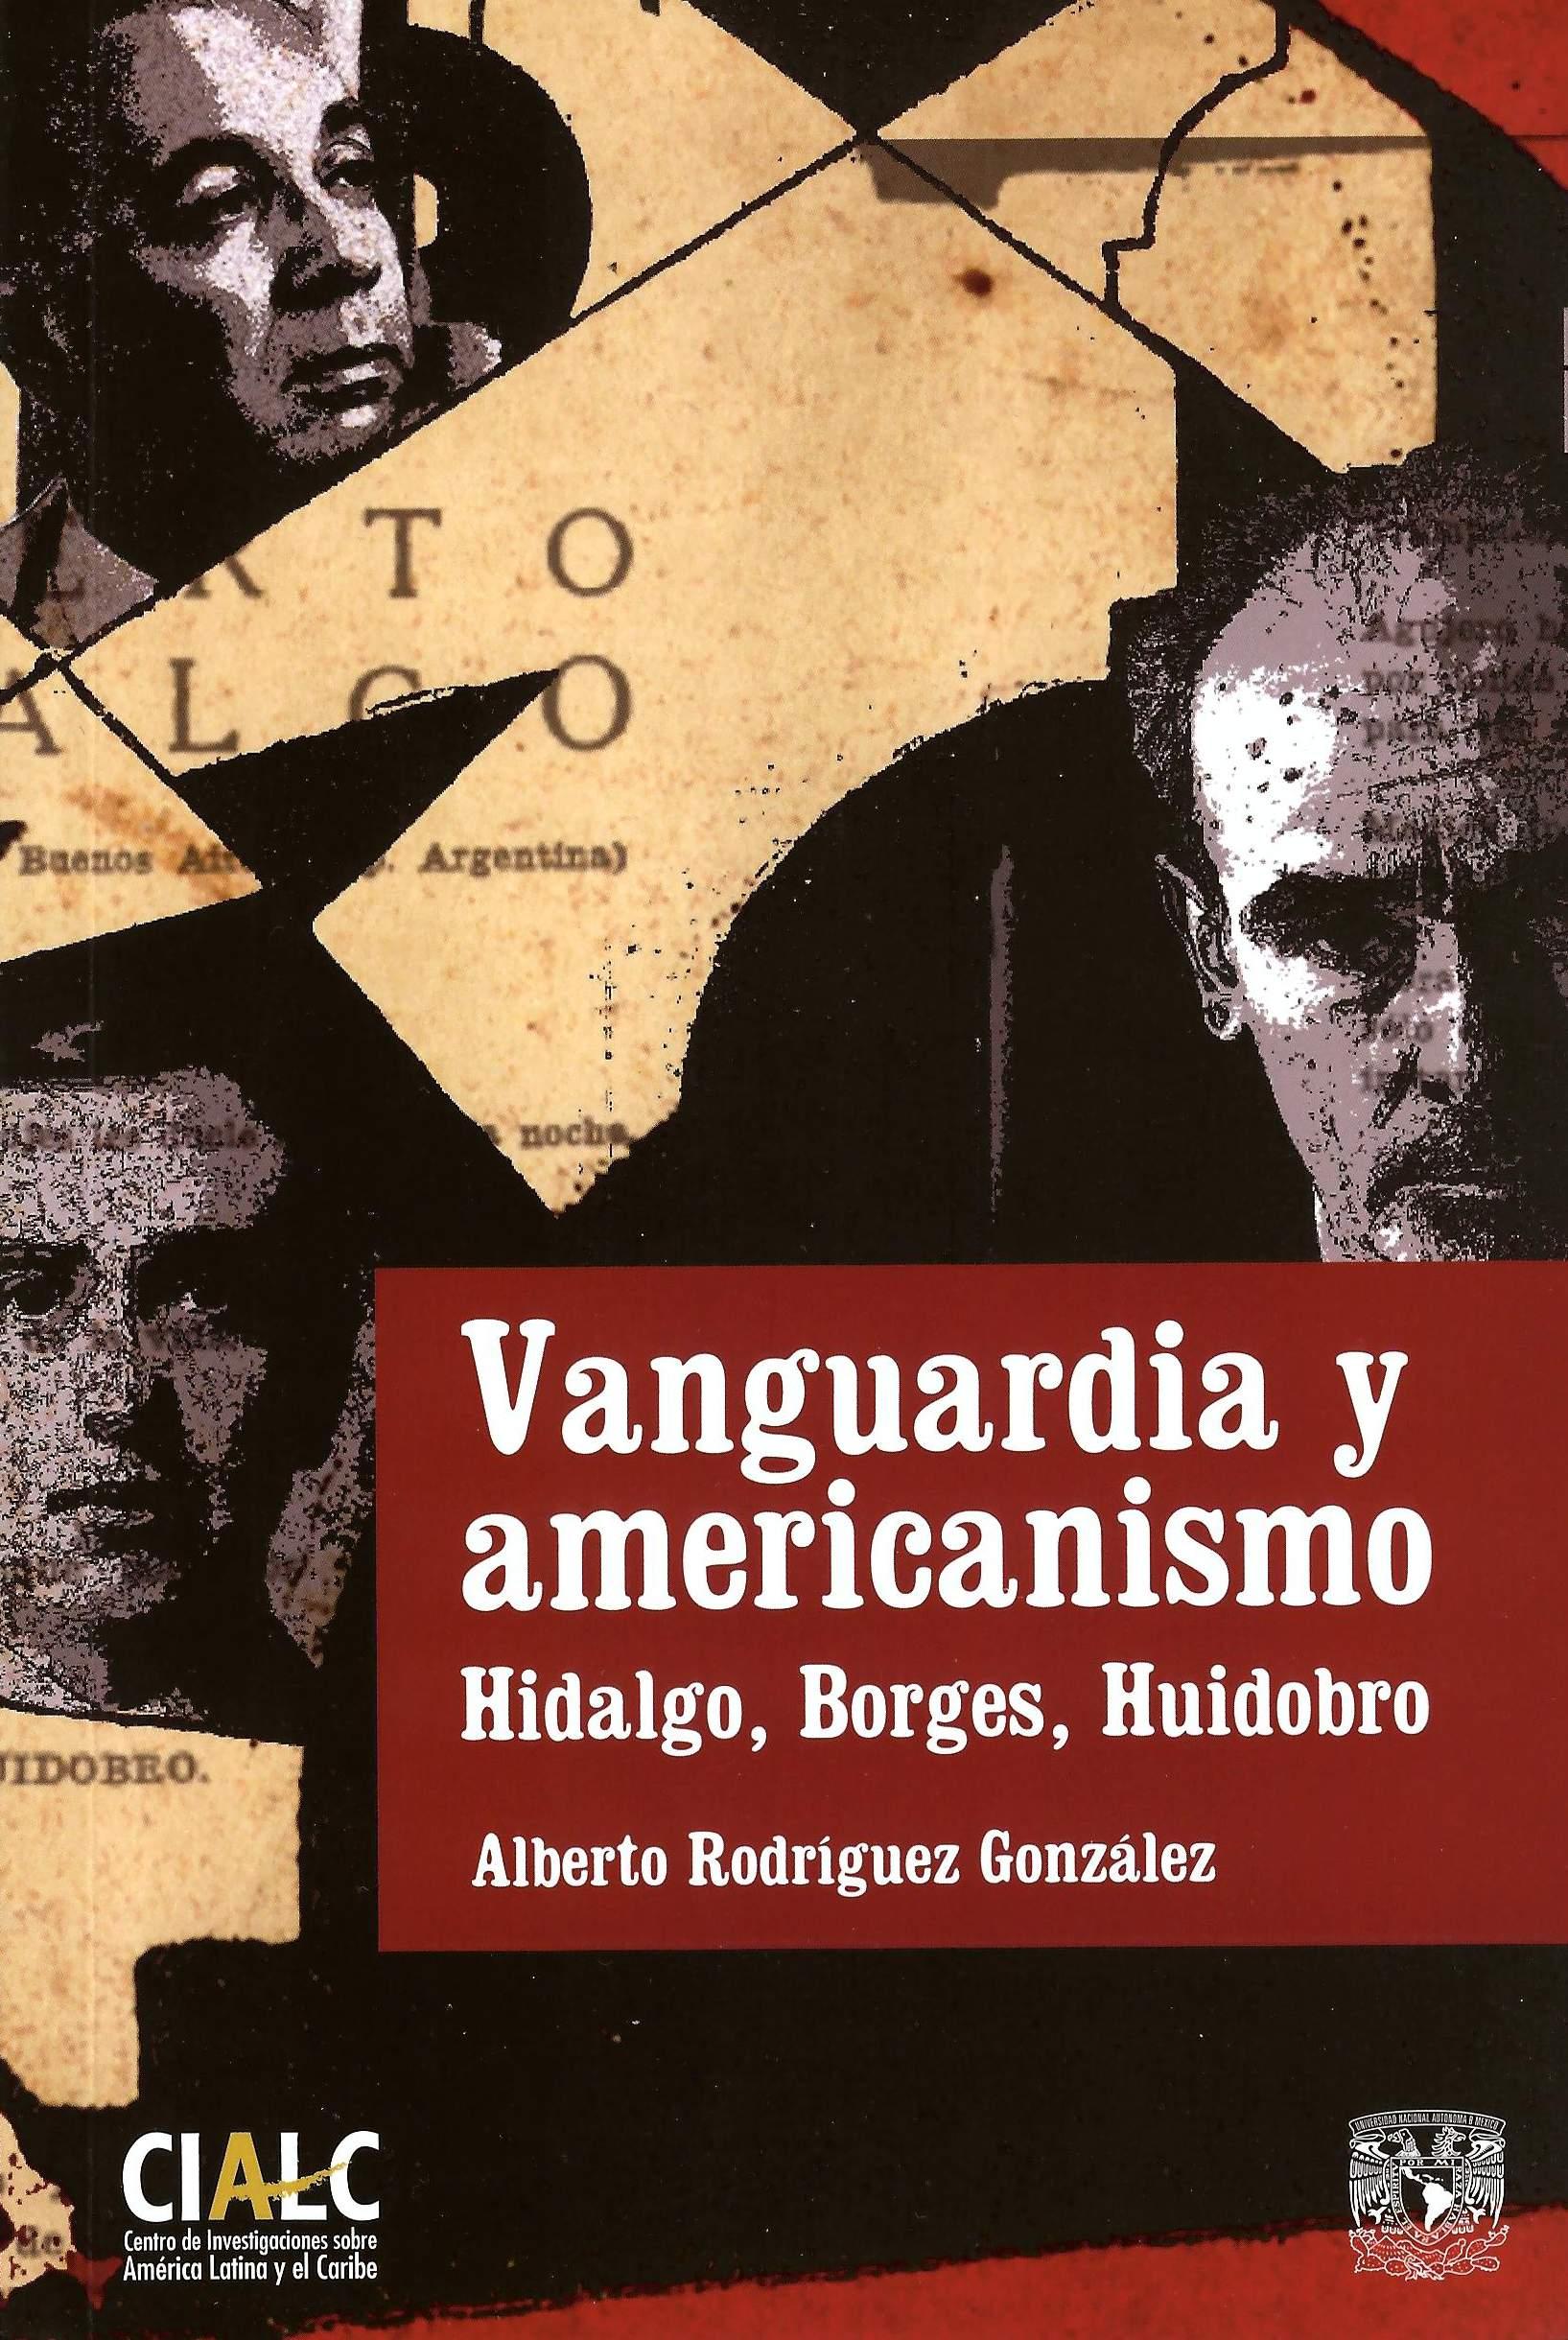 Vanguardia y americanismo: Hidalgo, Borges, Huidobro